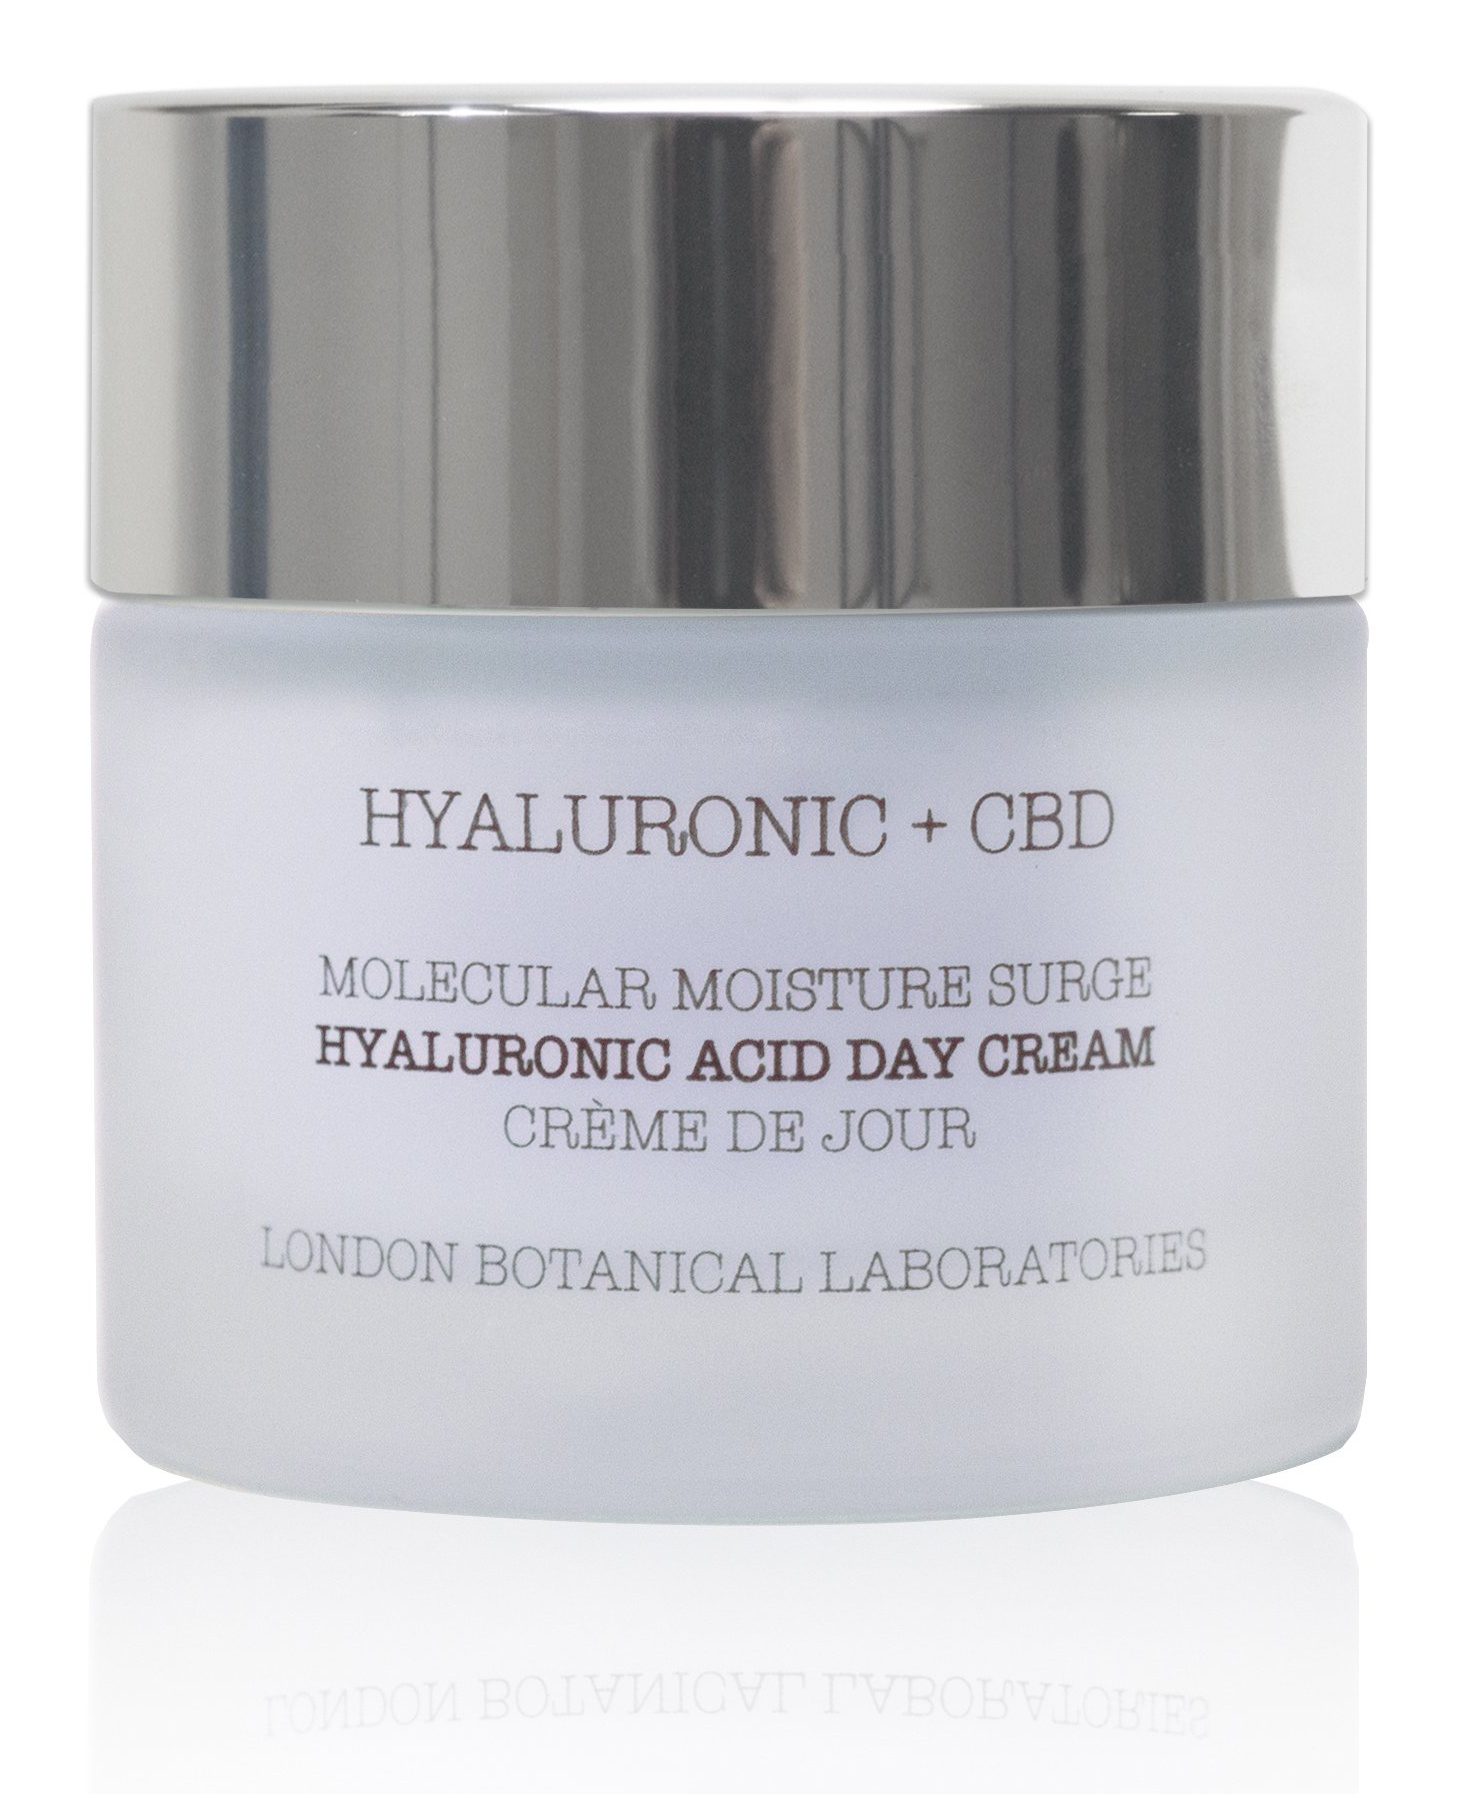 London Botanical Laboratories Hyaluronic + CBD Day Cream